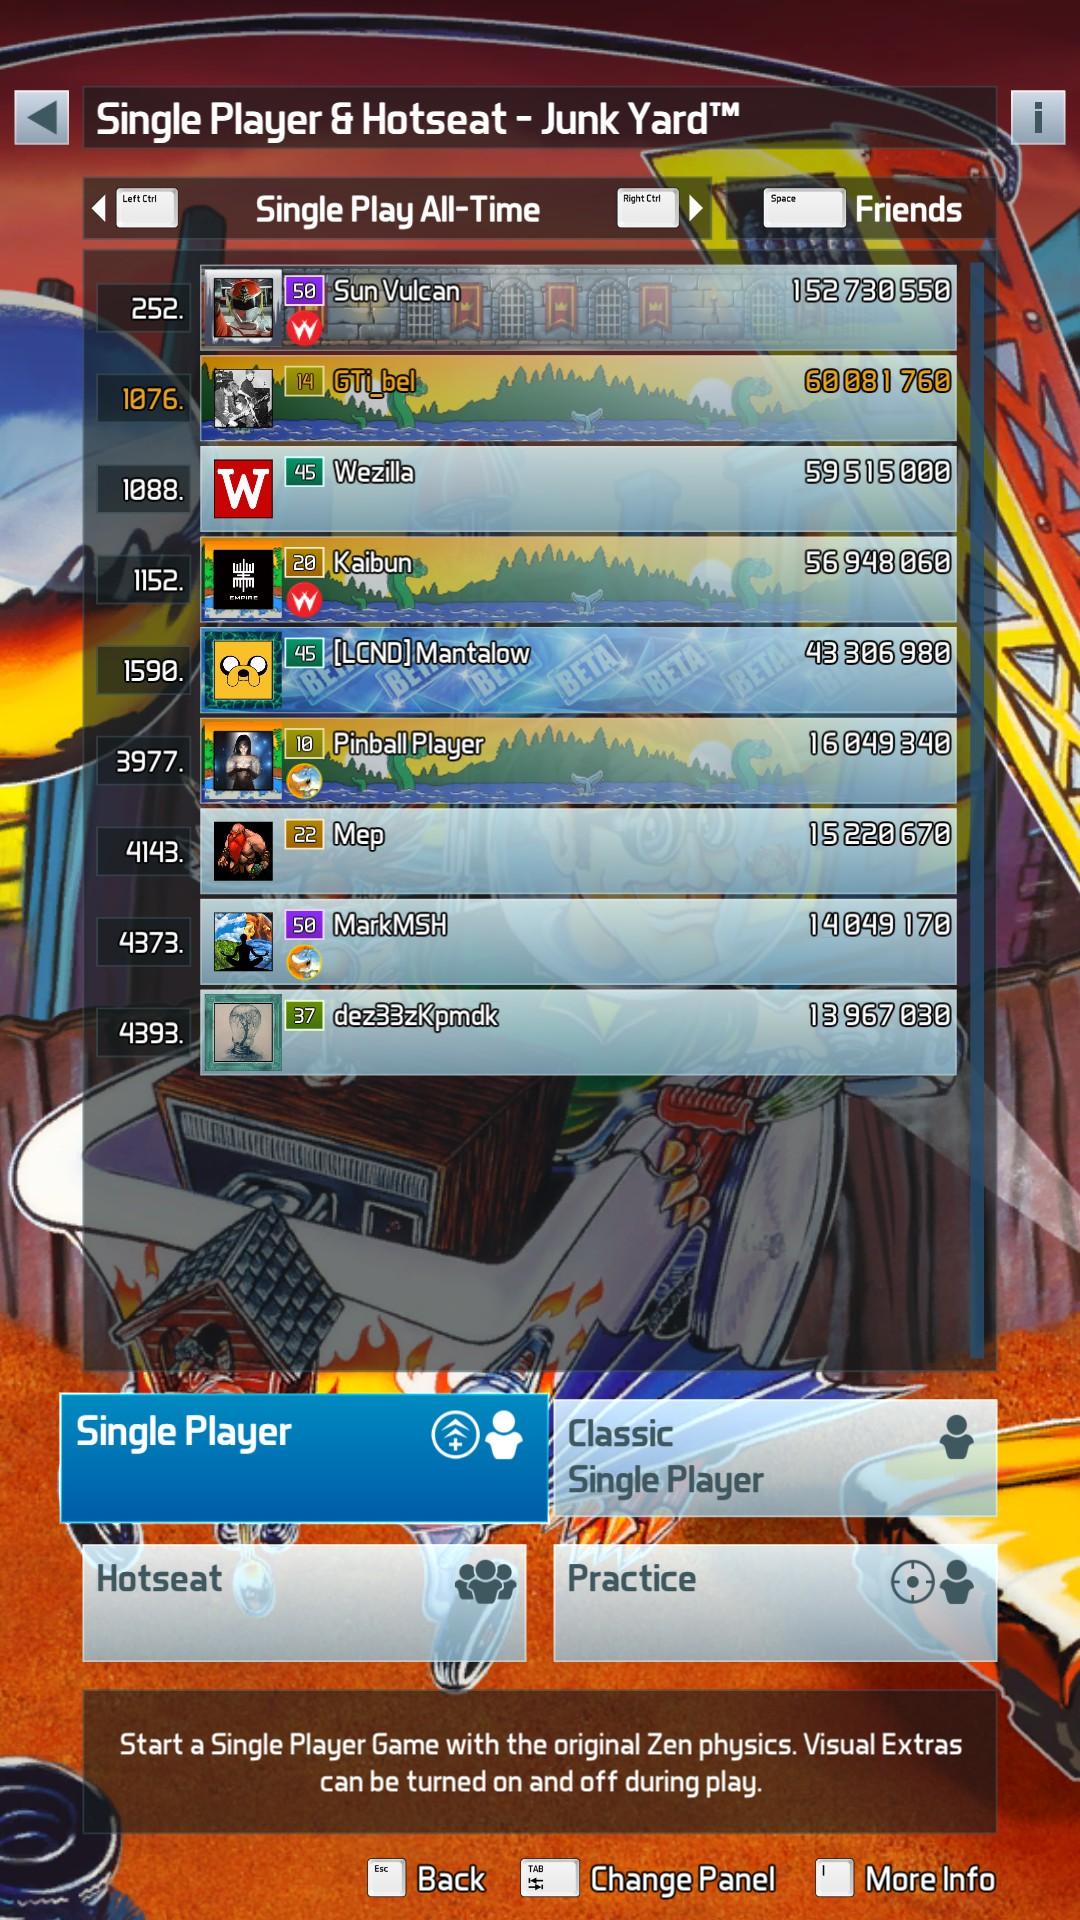 GTibel: Pinball FX3: JunkYard [Arcade] (PC) 60,081,760 points on 2019-01-22 12:43:47